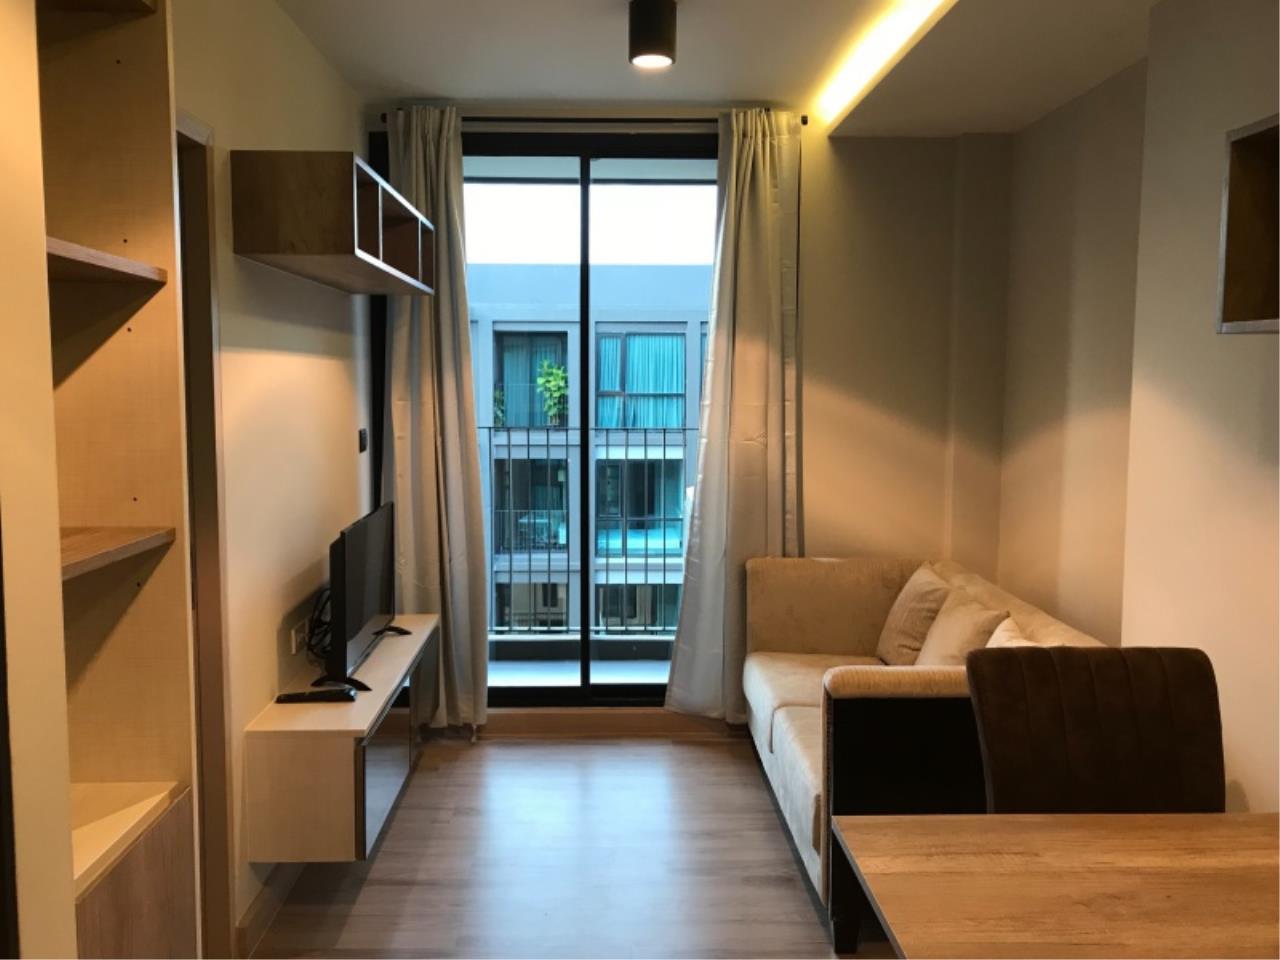 Century21 Skylux Agency's The Unique Sukhumvit 62/1 / Condo For Sale / 1 Bedroom / 33 SQM / BTS Bang Chak / Bangkok 1